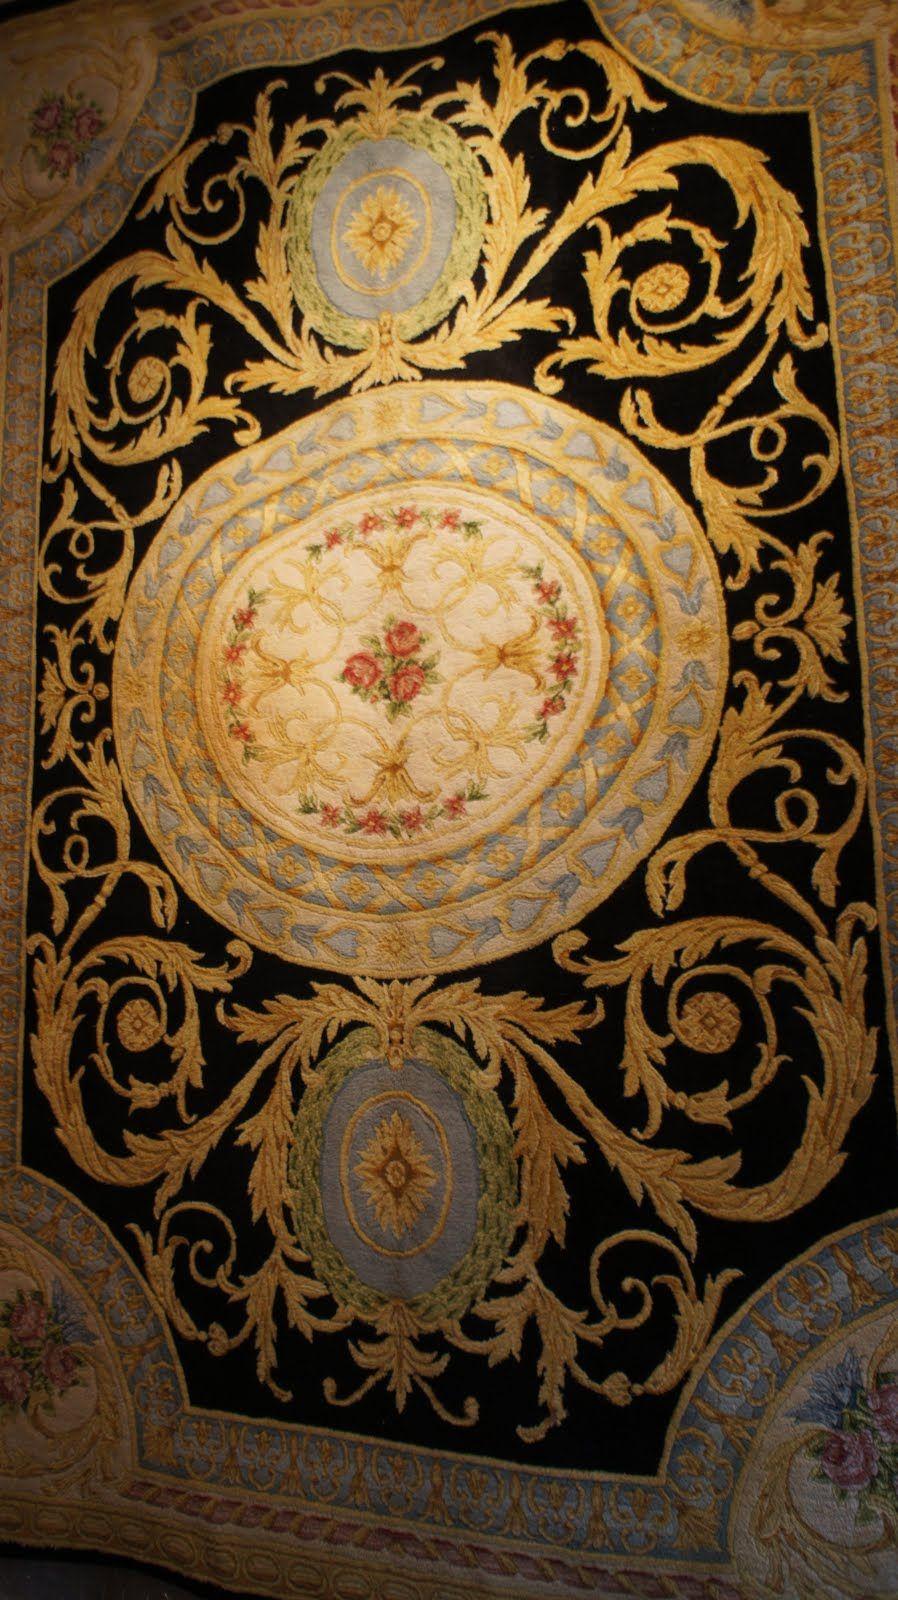 Une Savonnerie Francaise Xviii Eme Siecle Hotel Carpet Rugs On Carpet Persian Rug